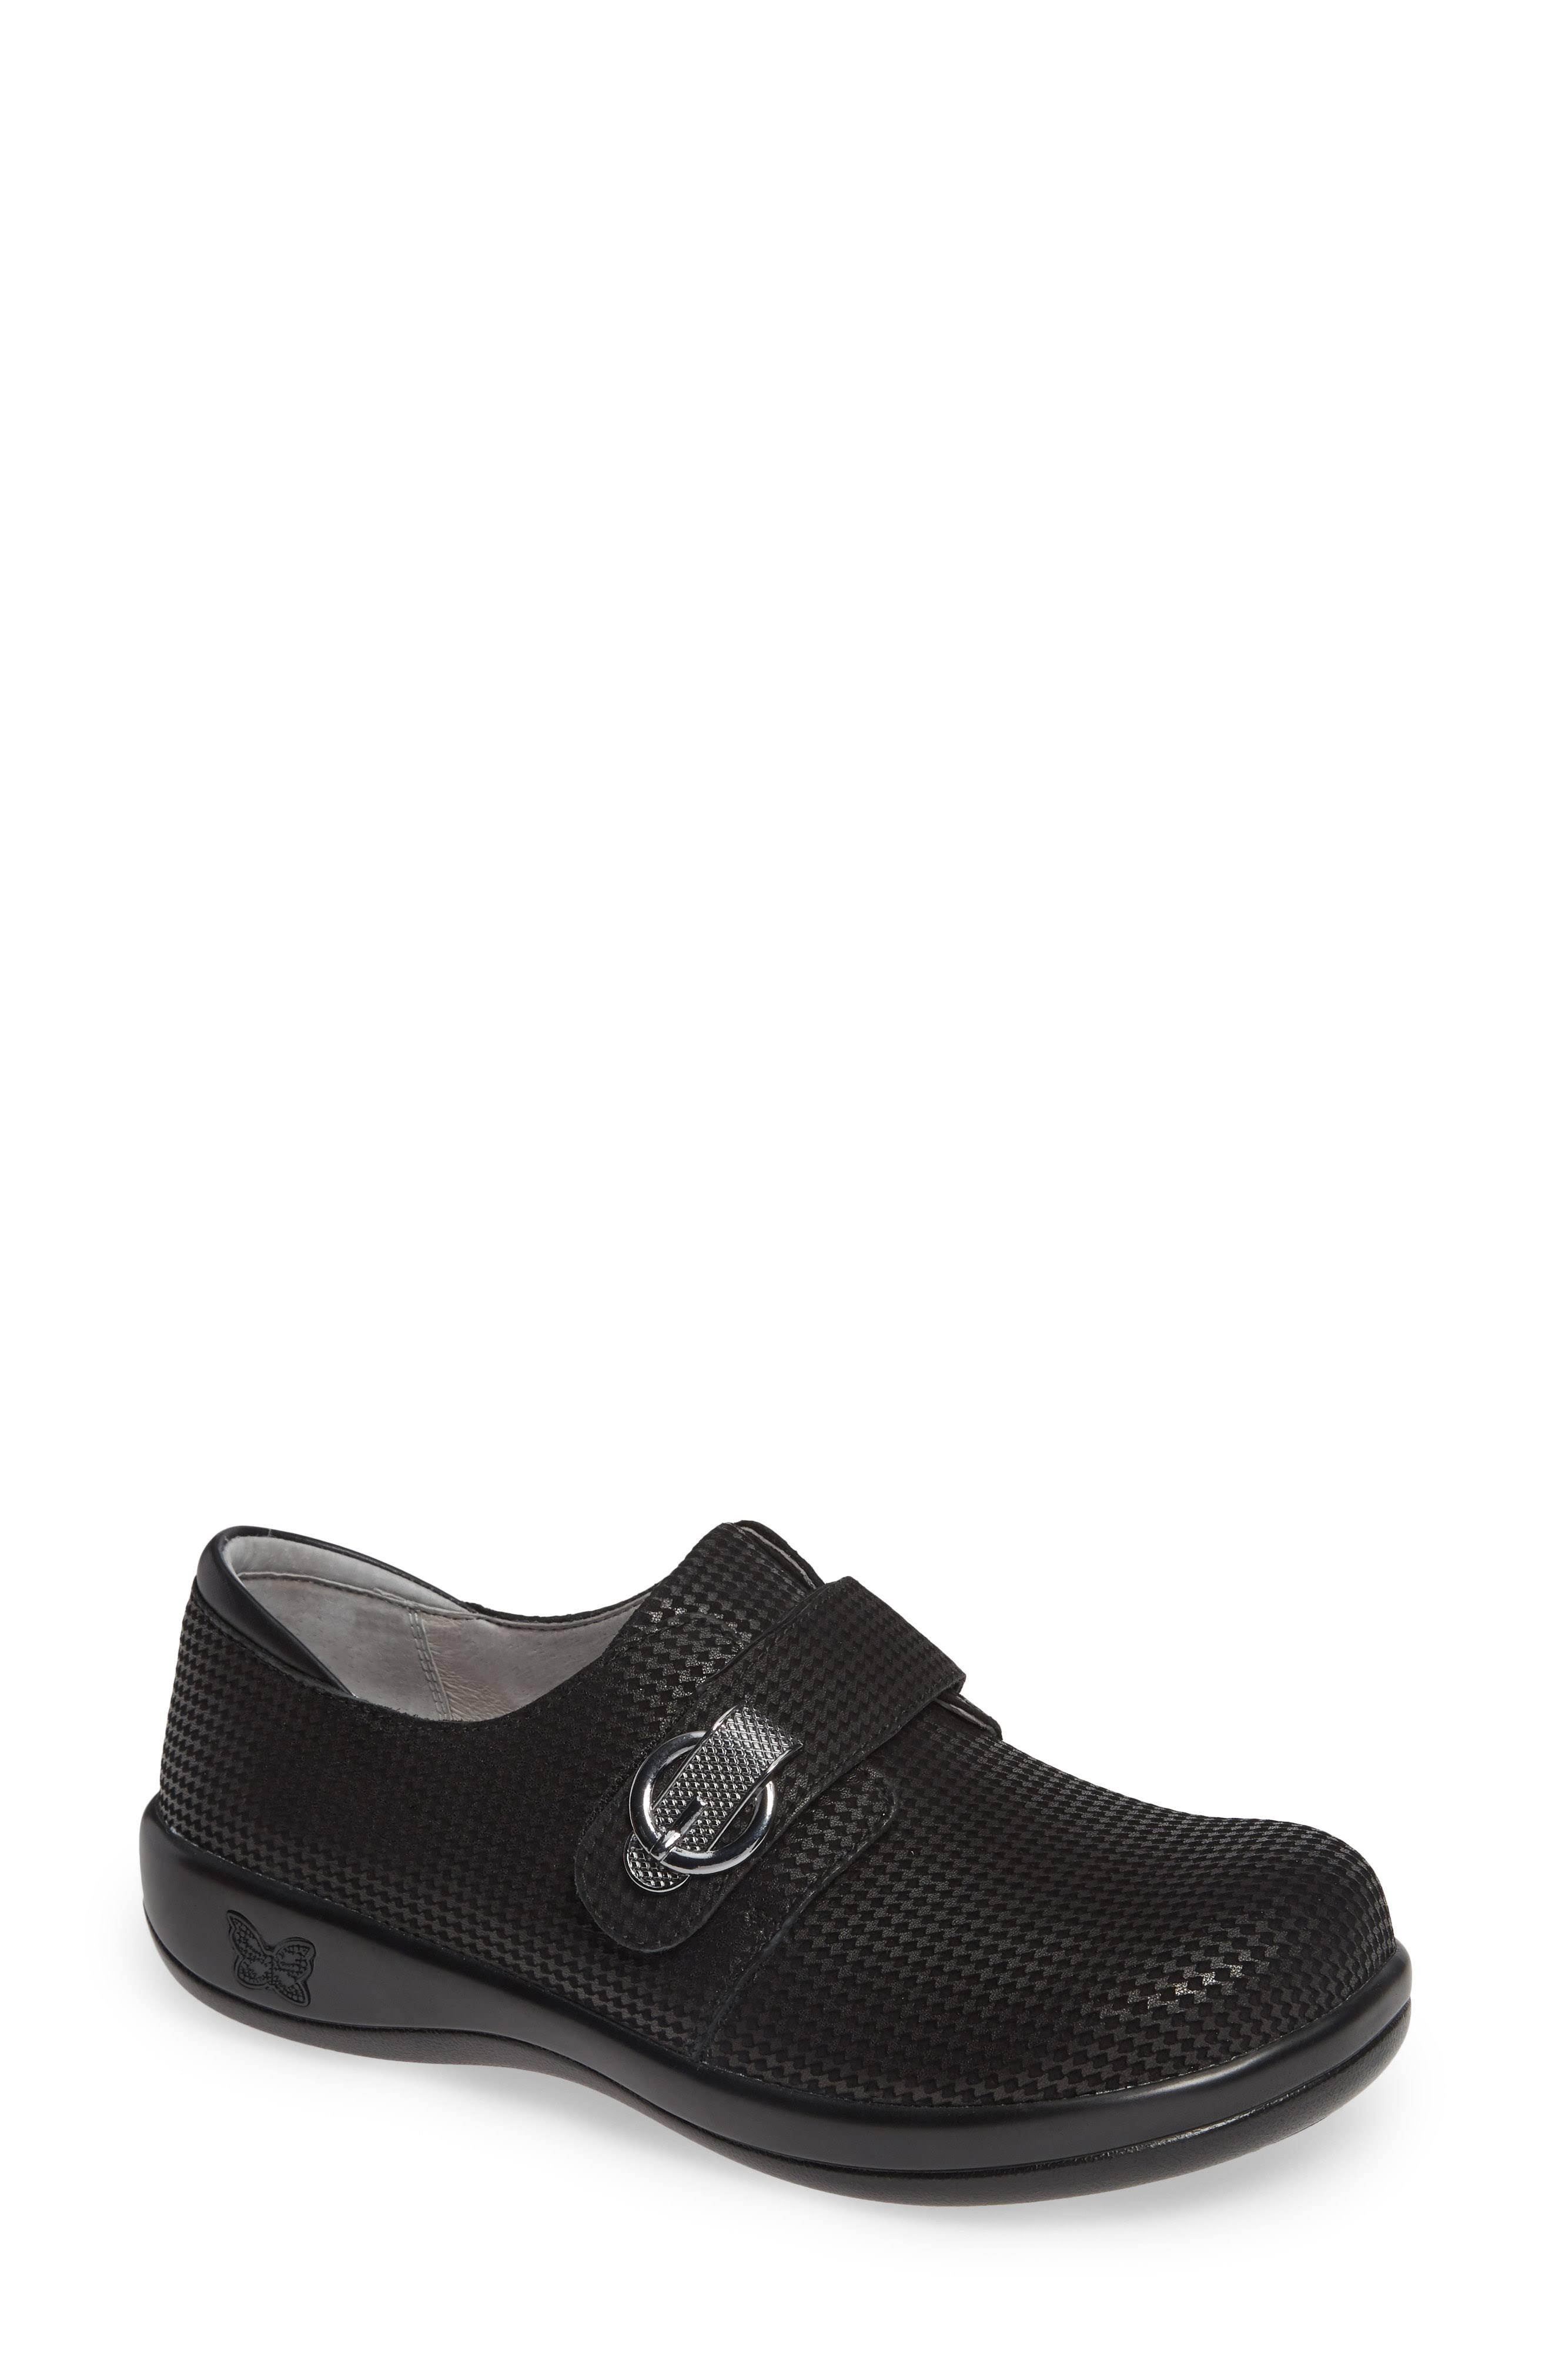 Alegria Joleen Shoes DonnaPied De 39 Poule Da Nnv0Owm8